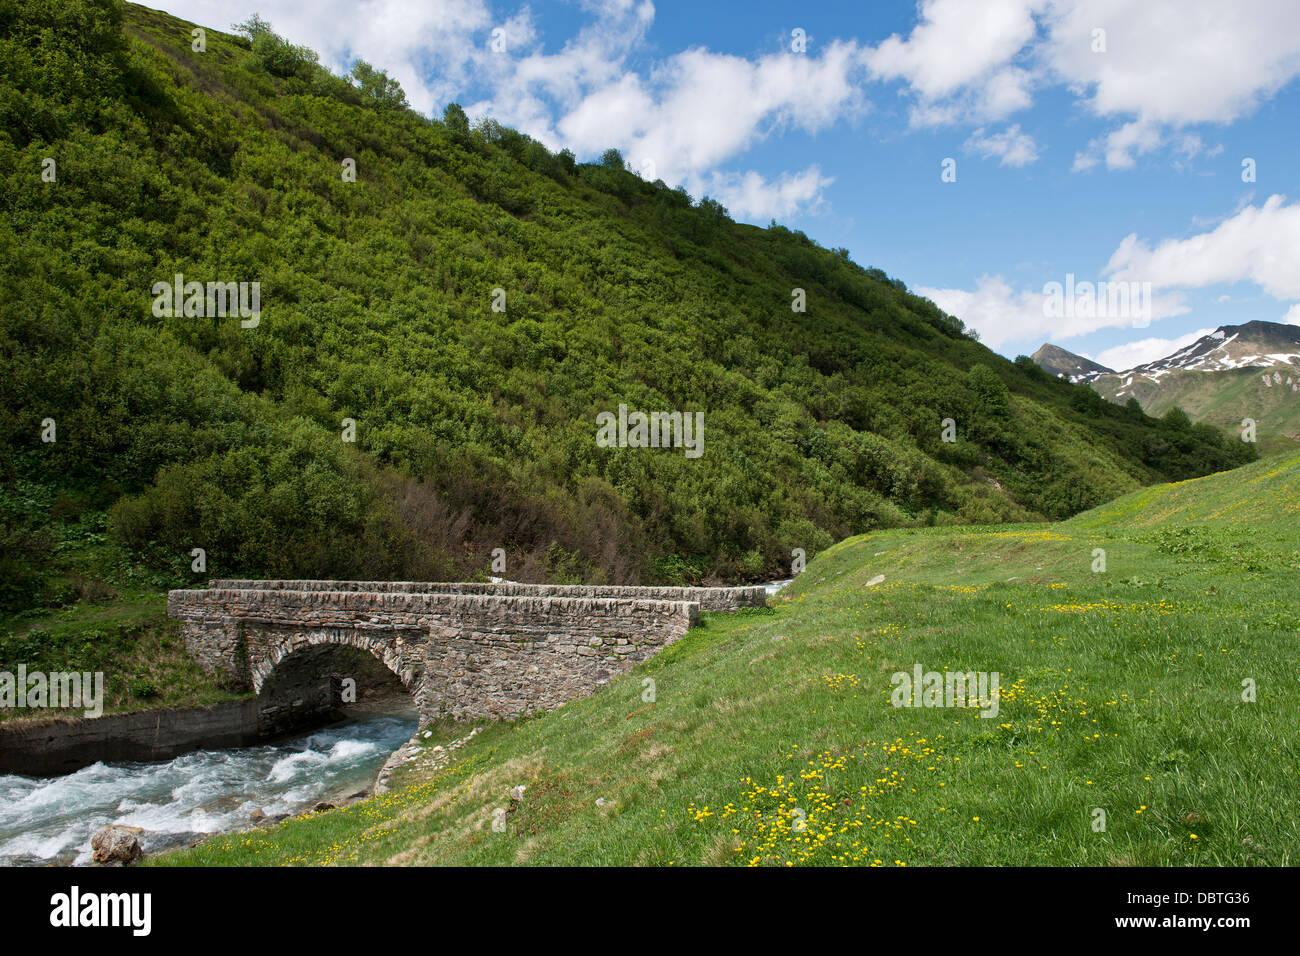 Switzerland, Canton Ticino, Ritom-Piora Stock Photo